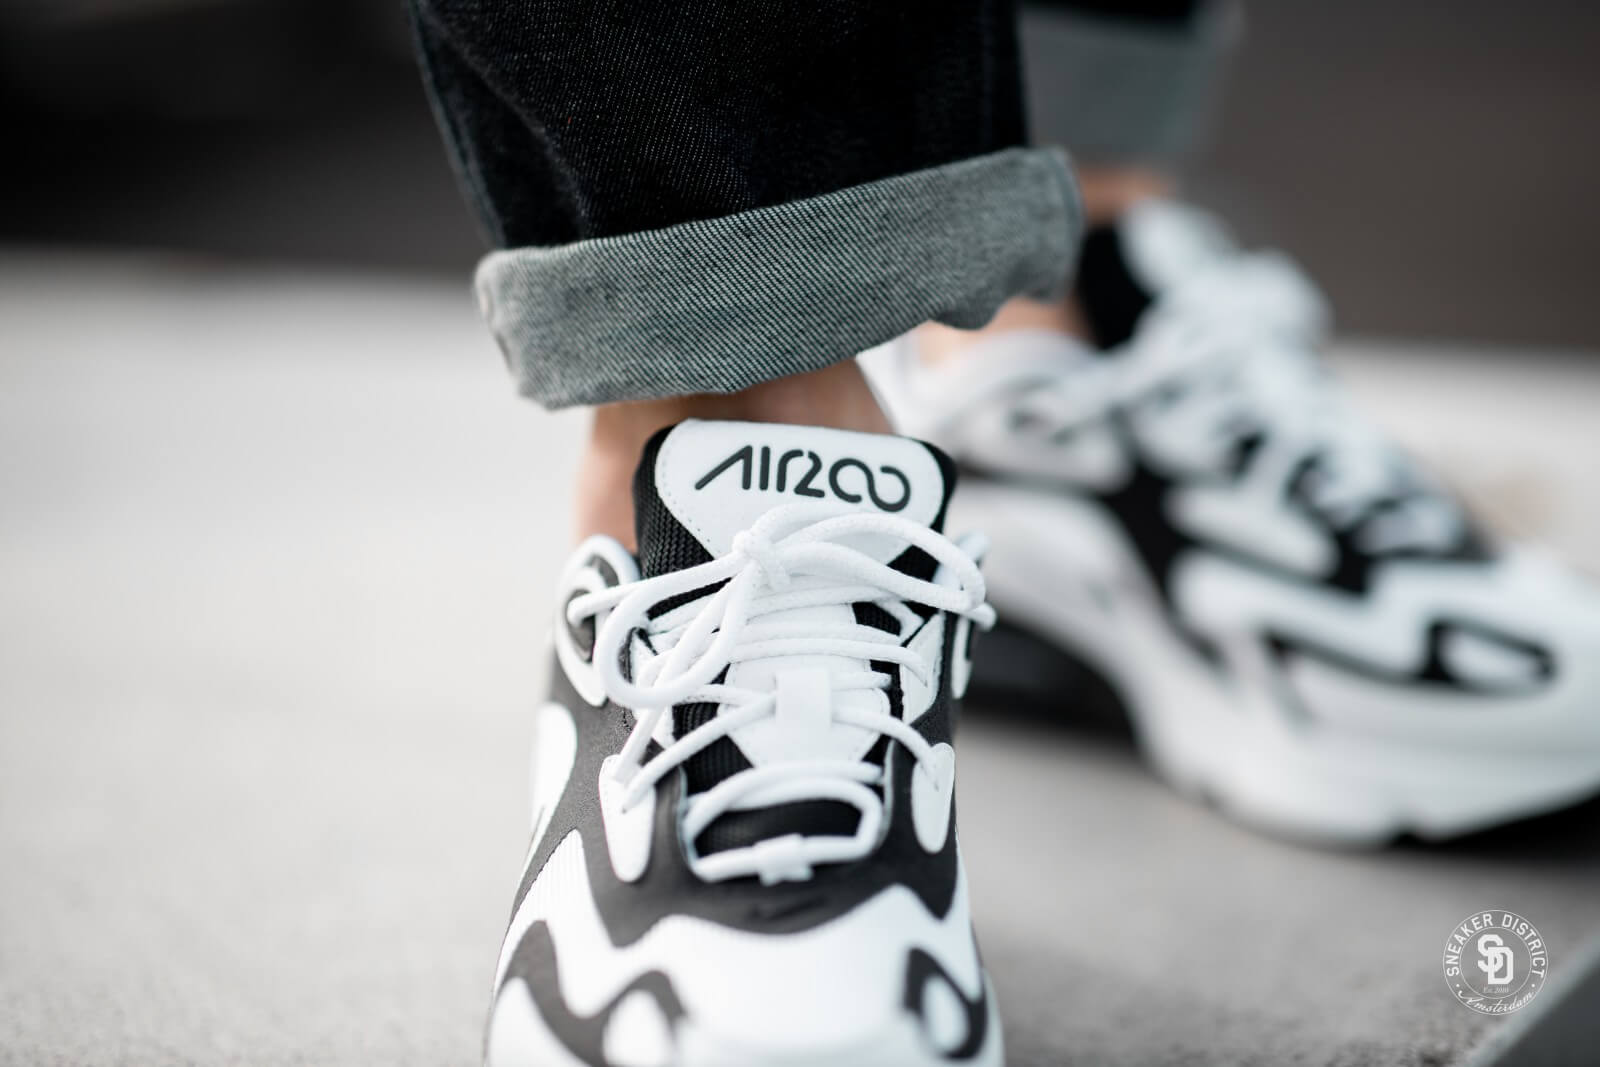 Nike Air Max 200 WhiteBlack Anthracite AQ2568 104